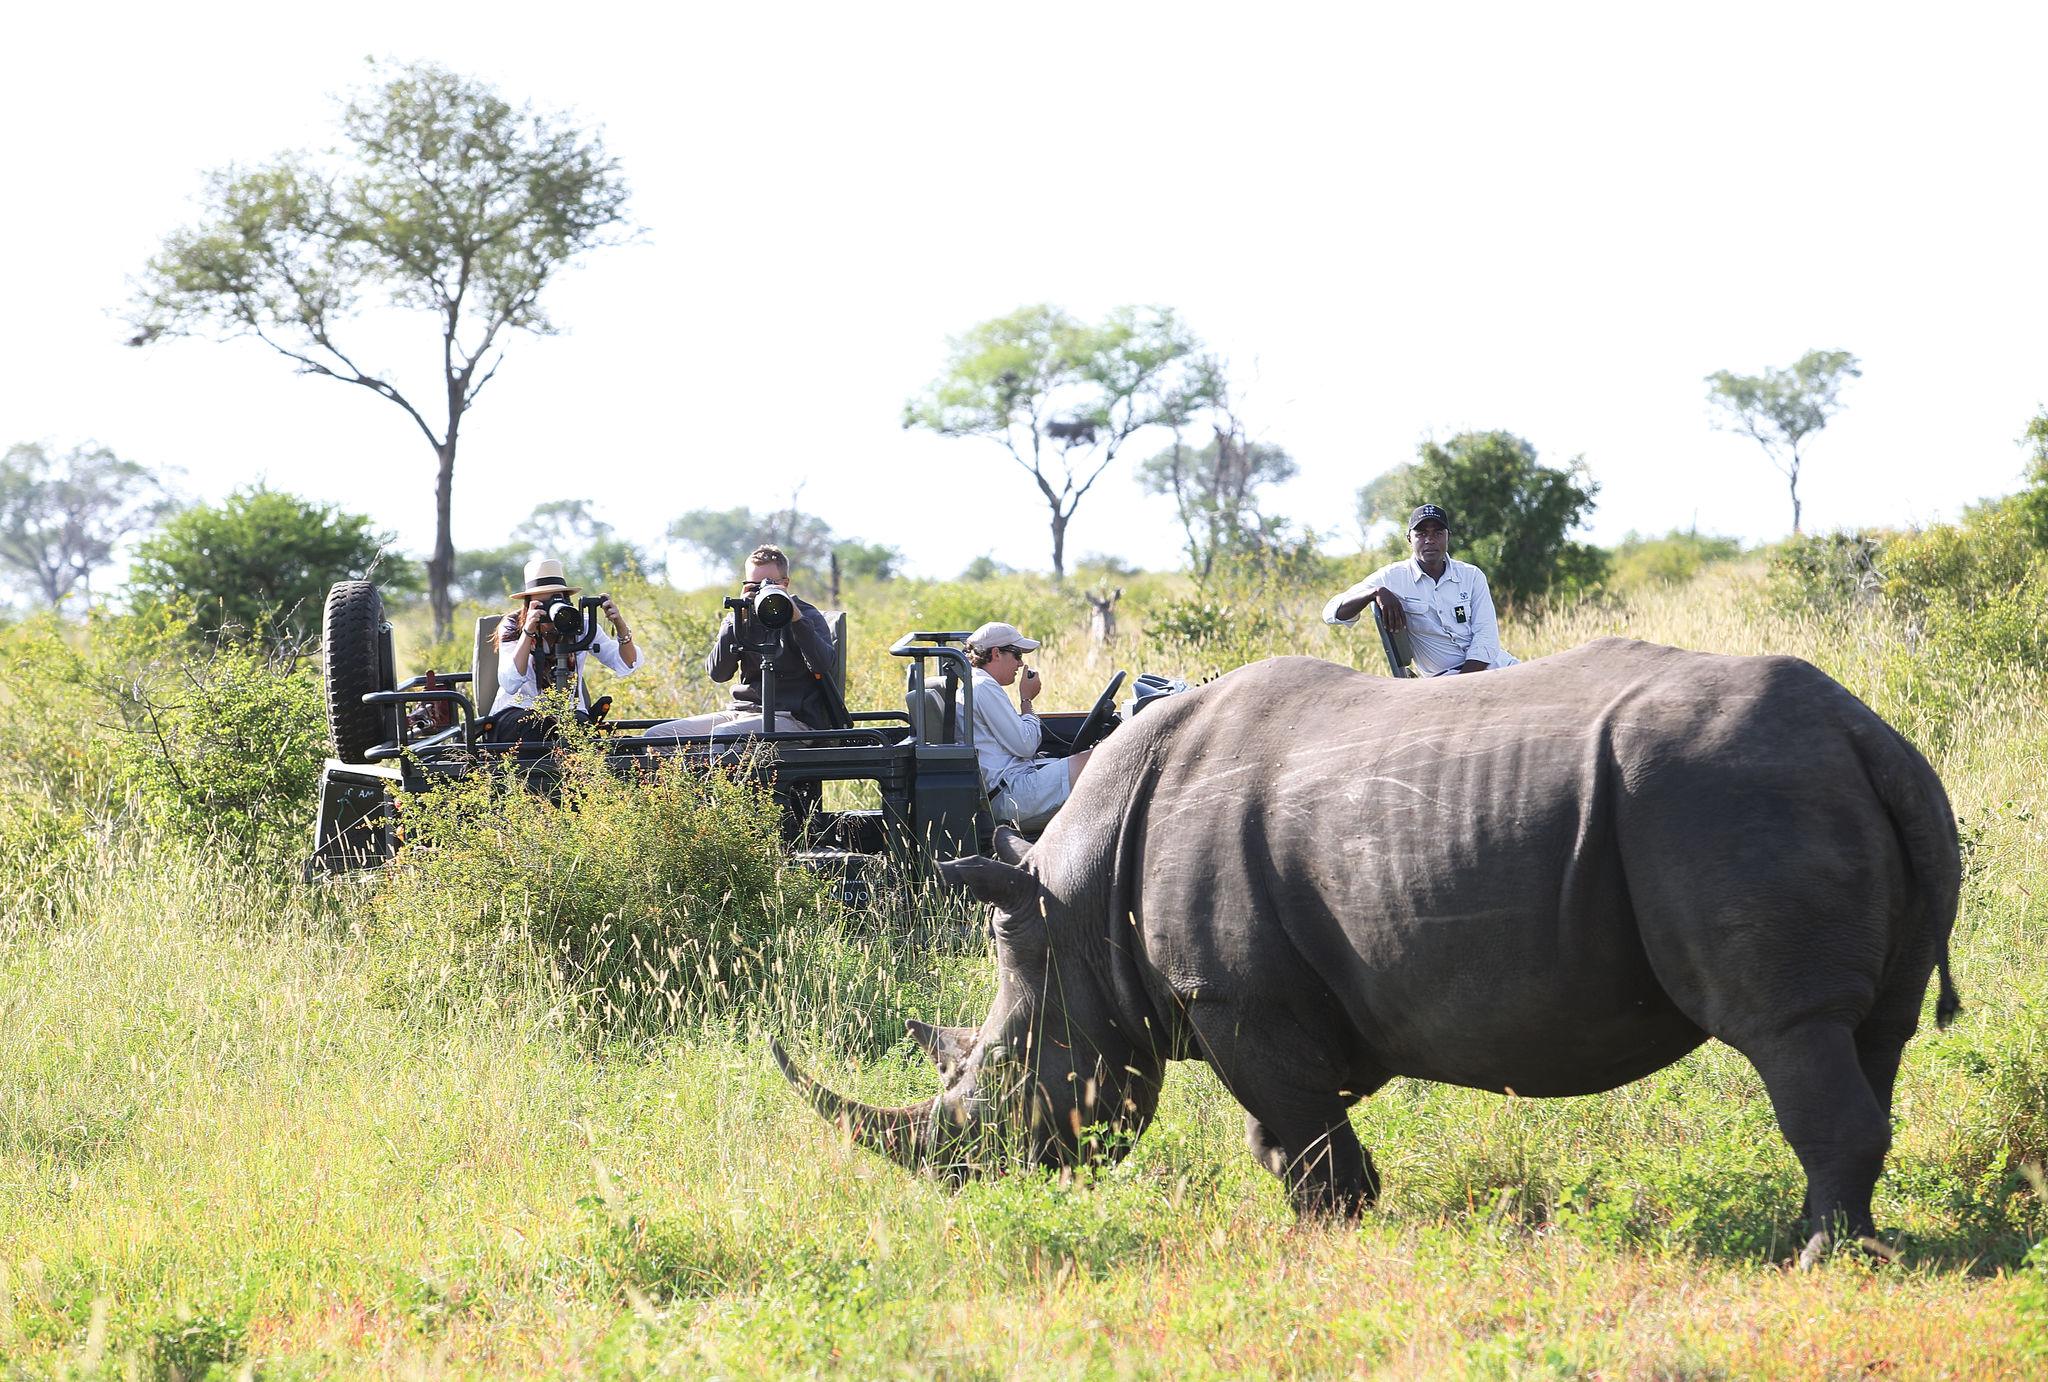 londolozi-activities-photographic-safari-03